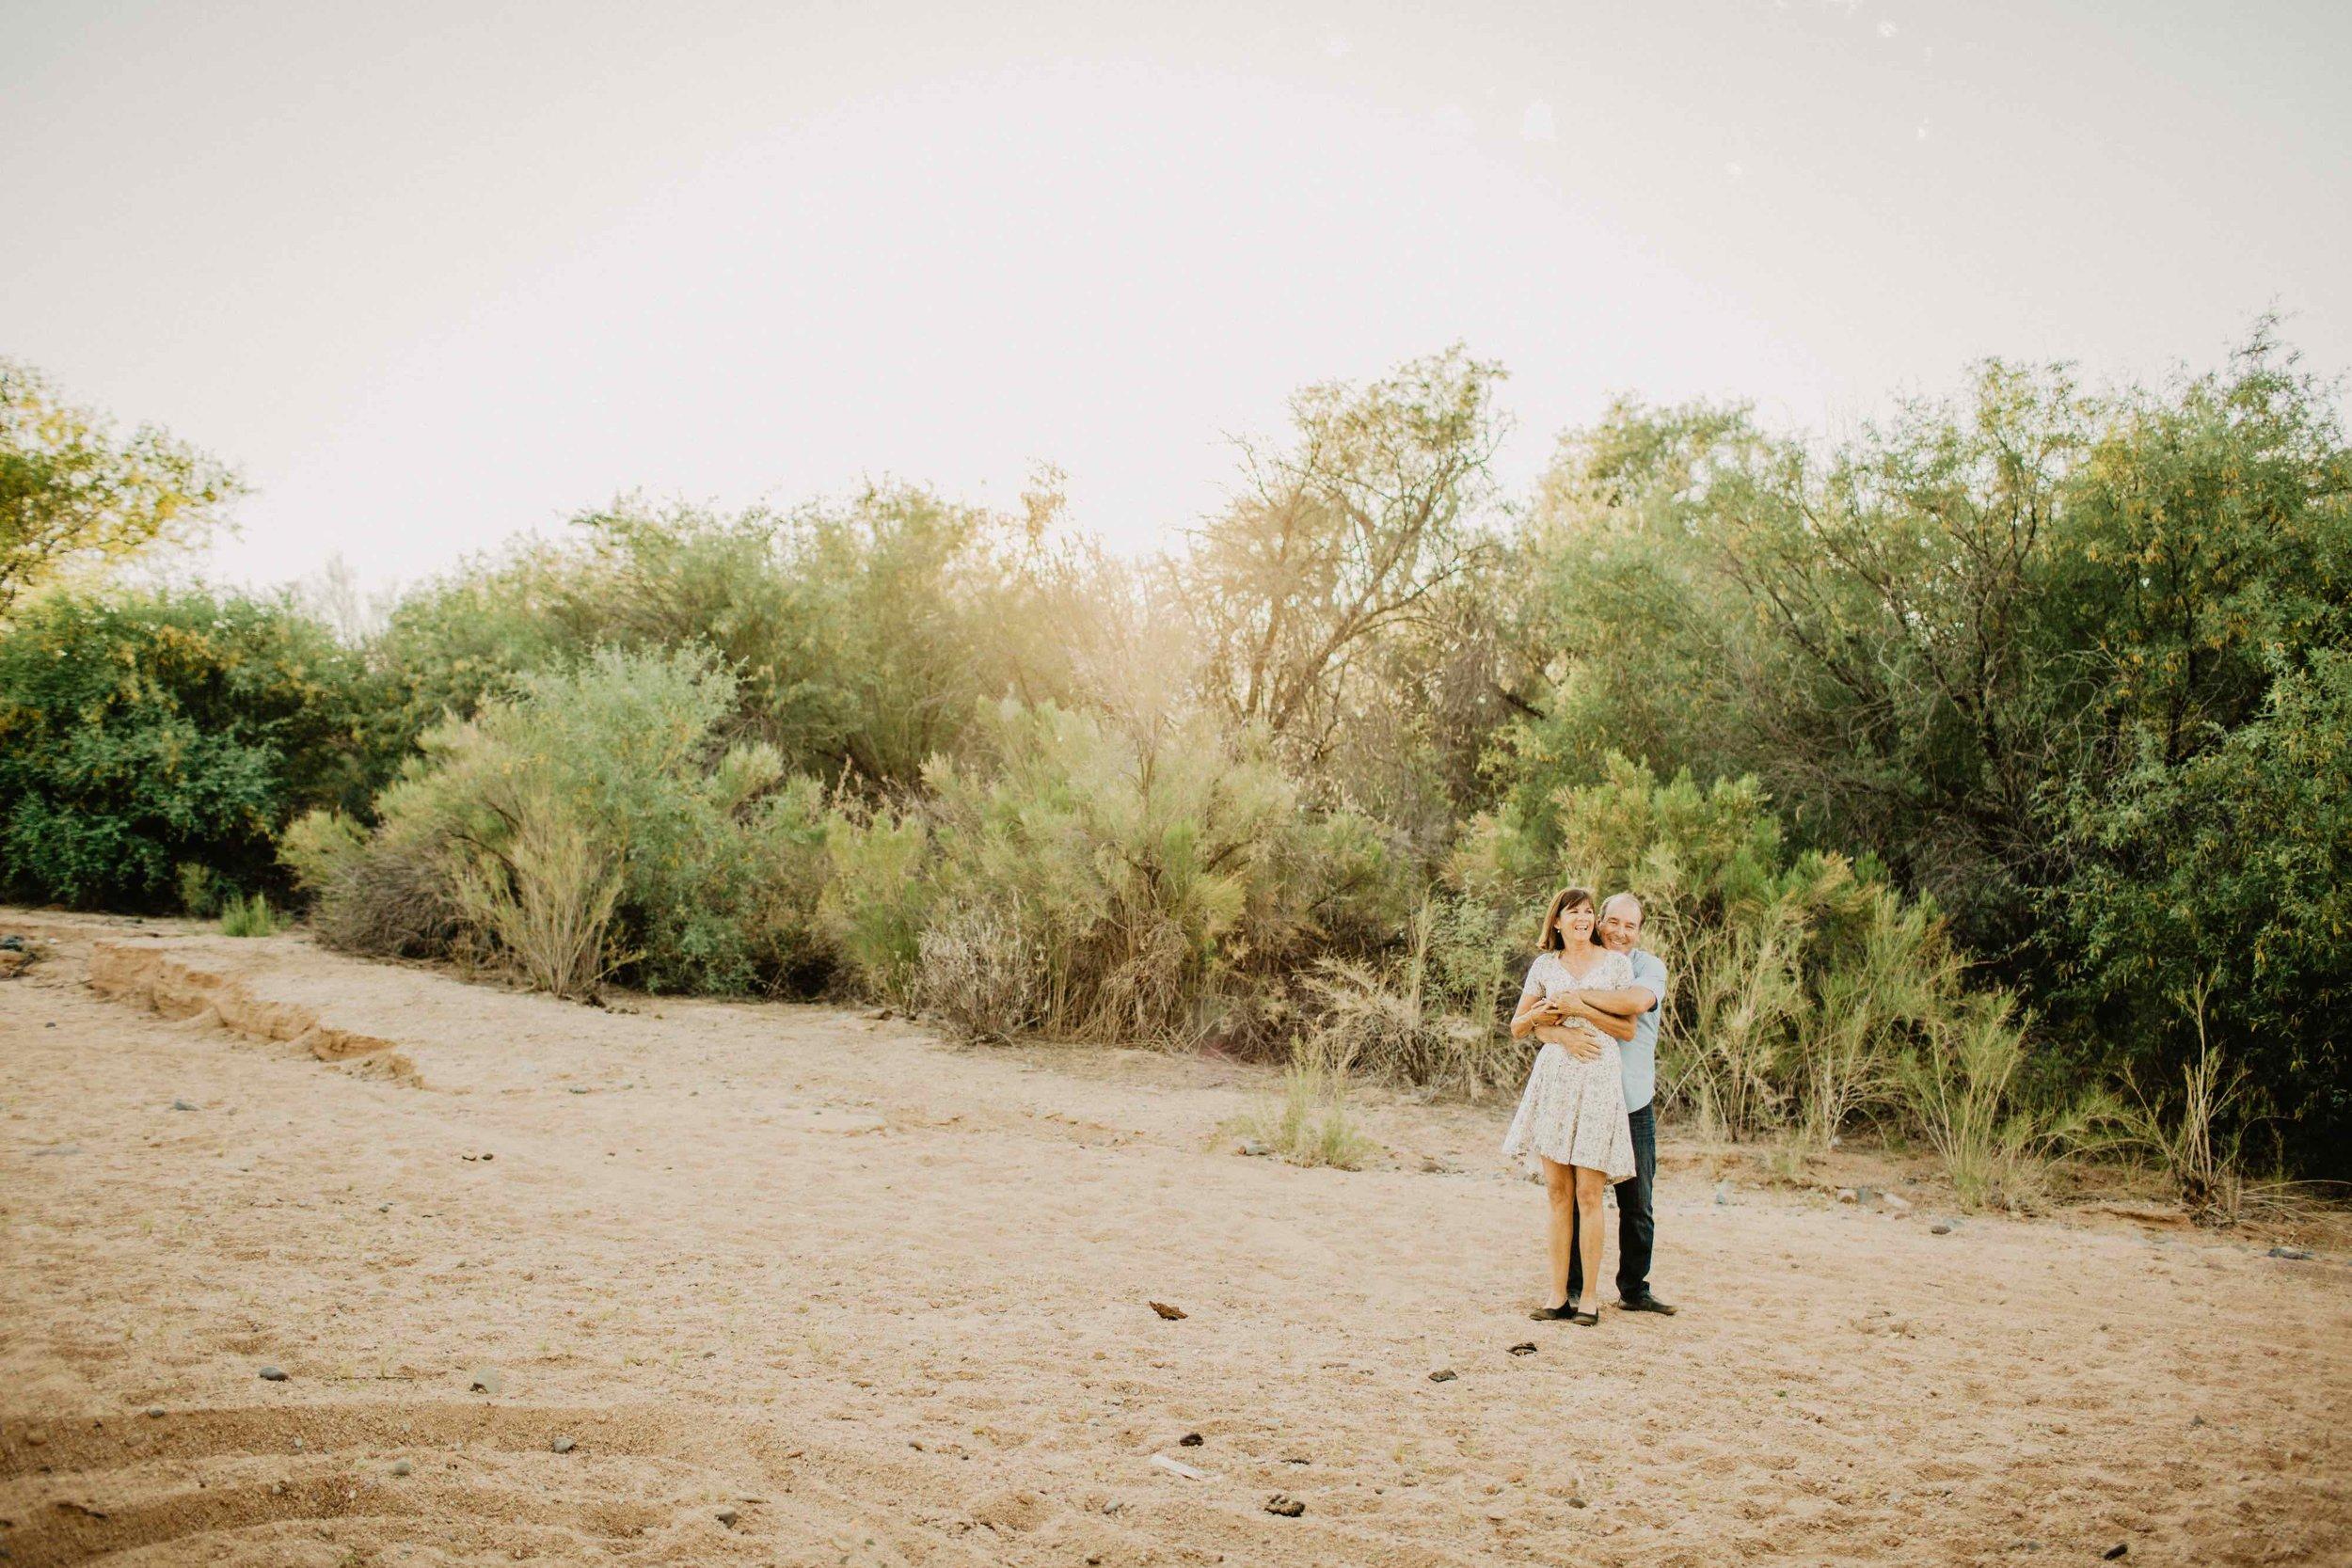 Kisa Conrad Favorites-0005-colorado-wedding-photographer-denver-springs-vail-.jpeg